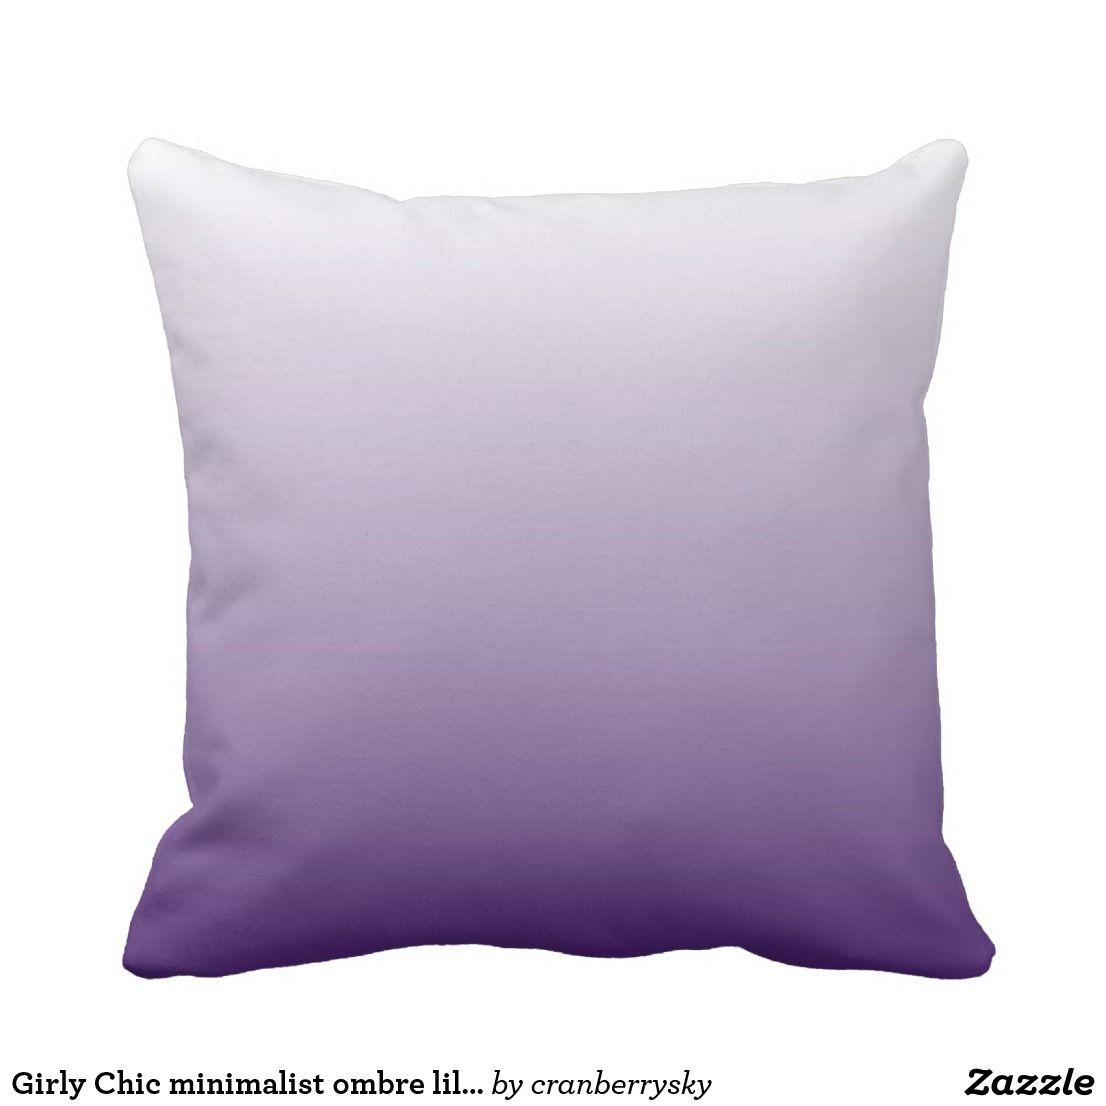 Girly Chic minimalist ombre lilac lavender purple Throw Pillow | Zazzle.com